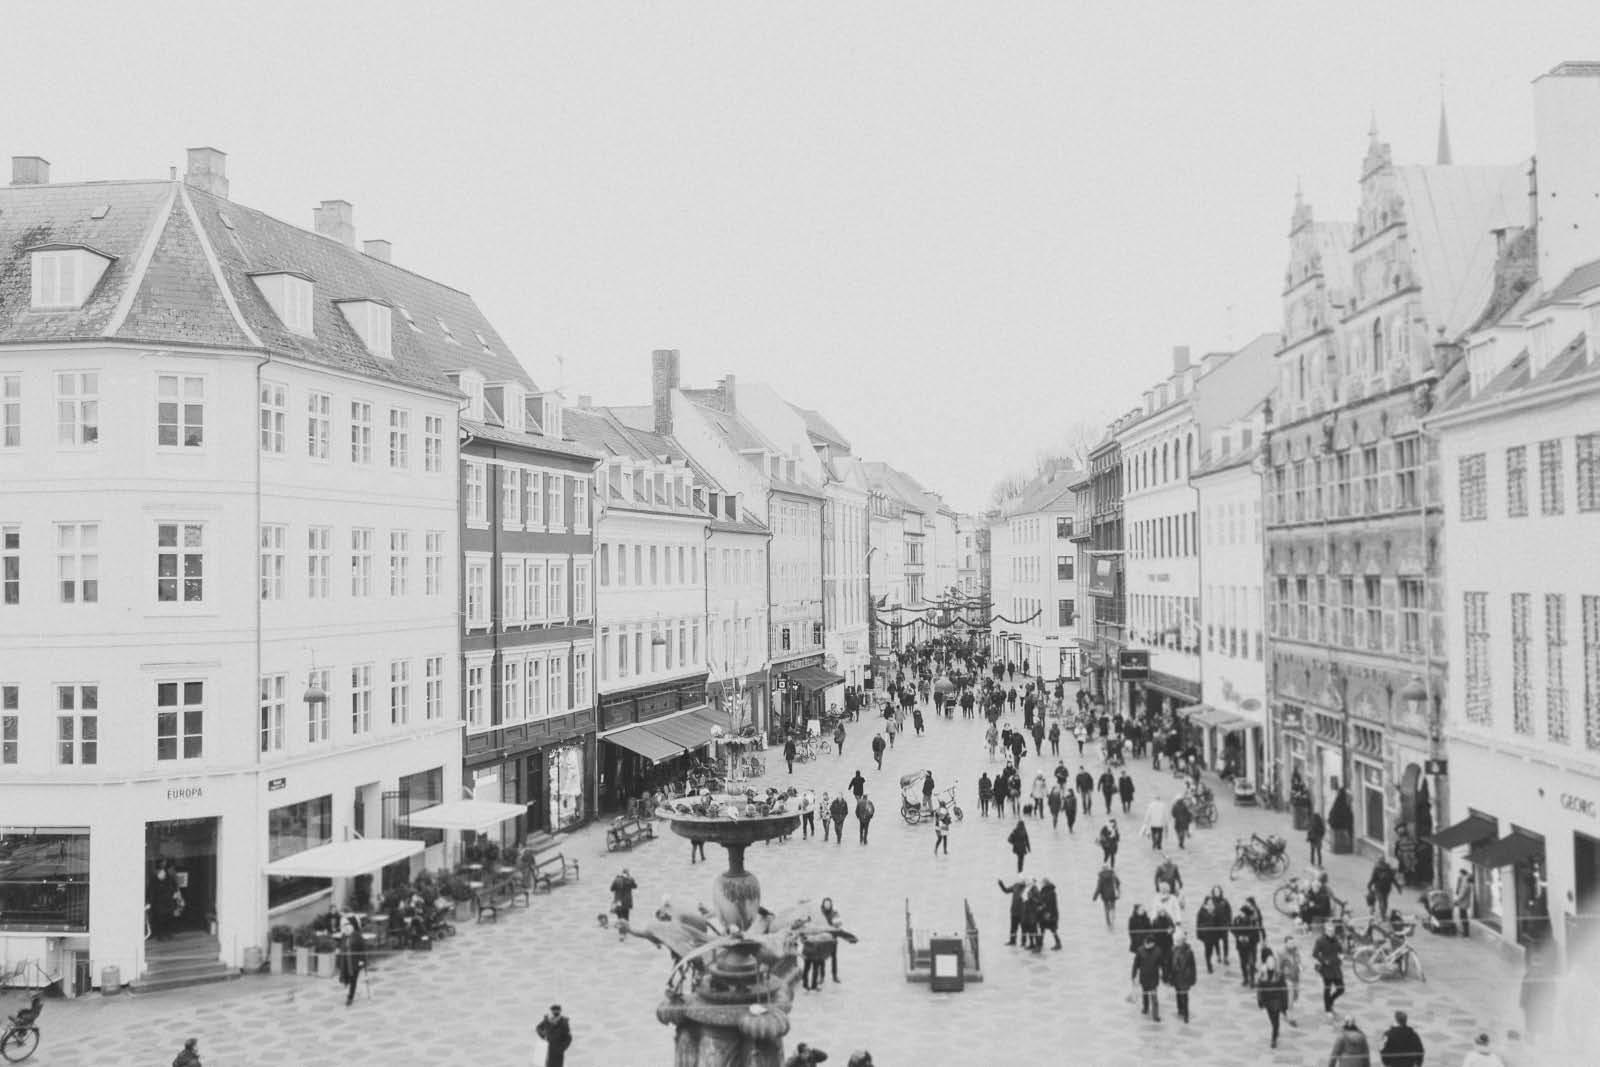 Sweden_roadtrip_Evabloem-0126.jpg